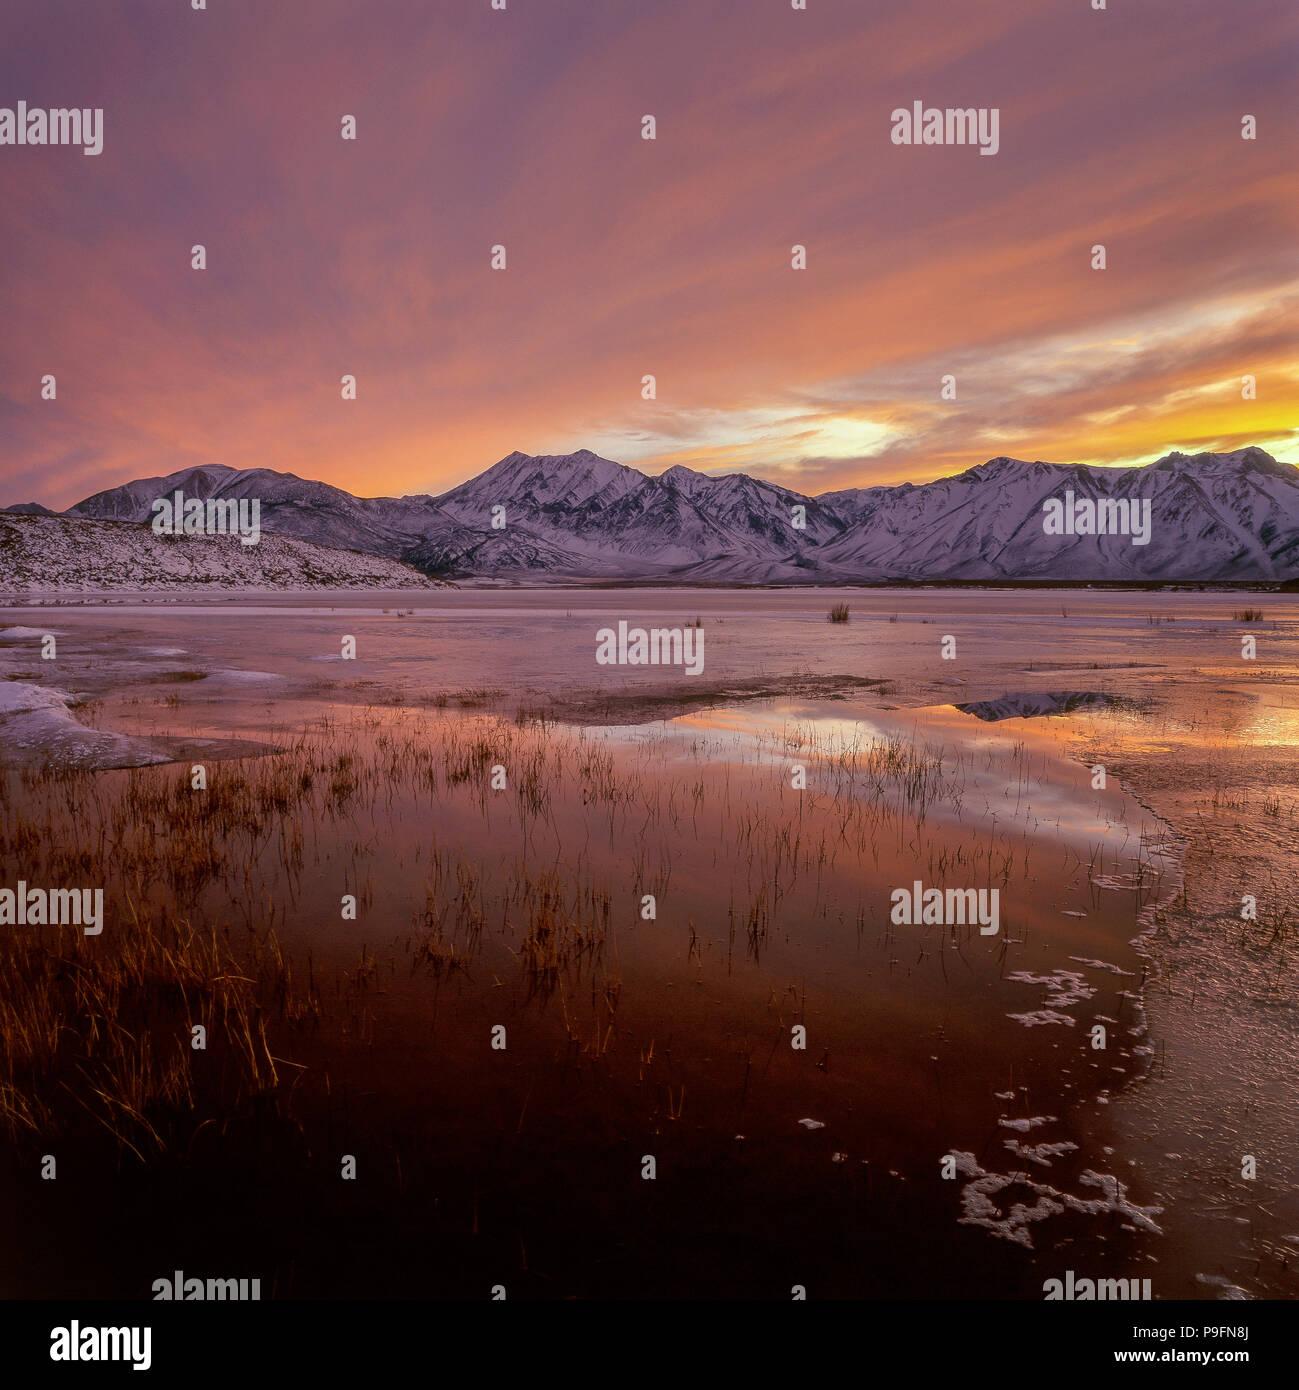 Tramonto sul lago Crowley, Mount Morgan, Montagna Rossa, Inyo National Forest, Sierra orientale, California Immagini Stock